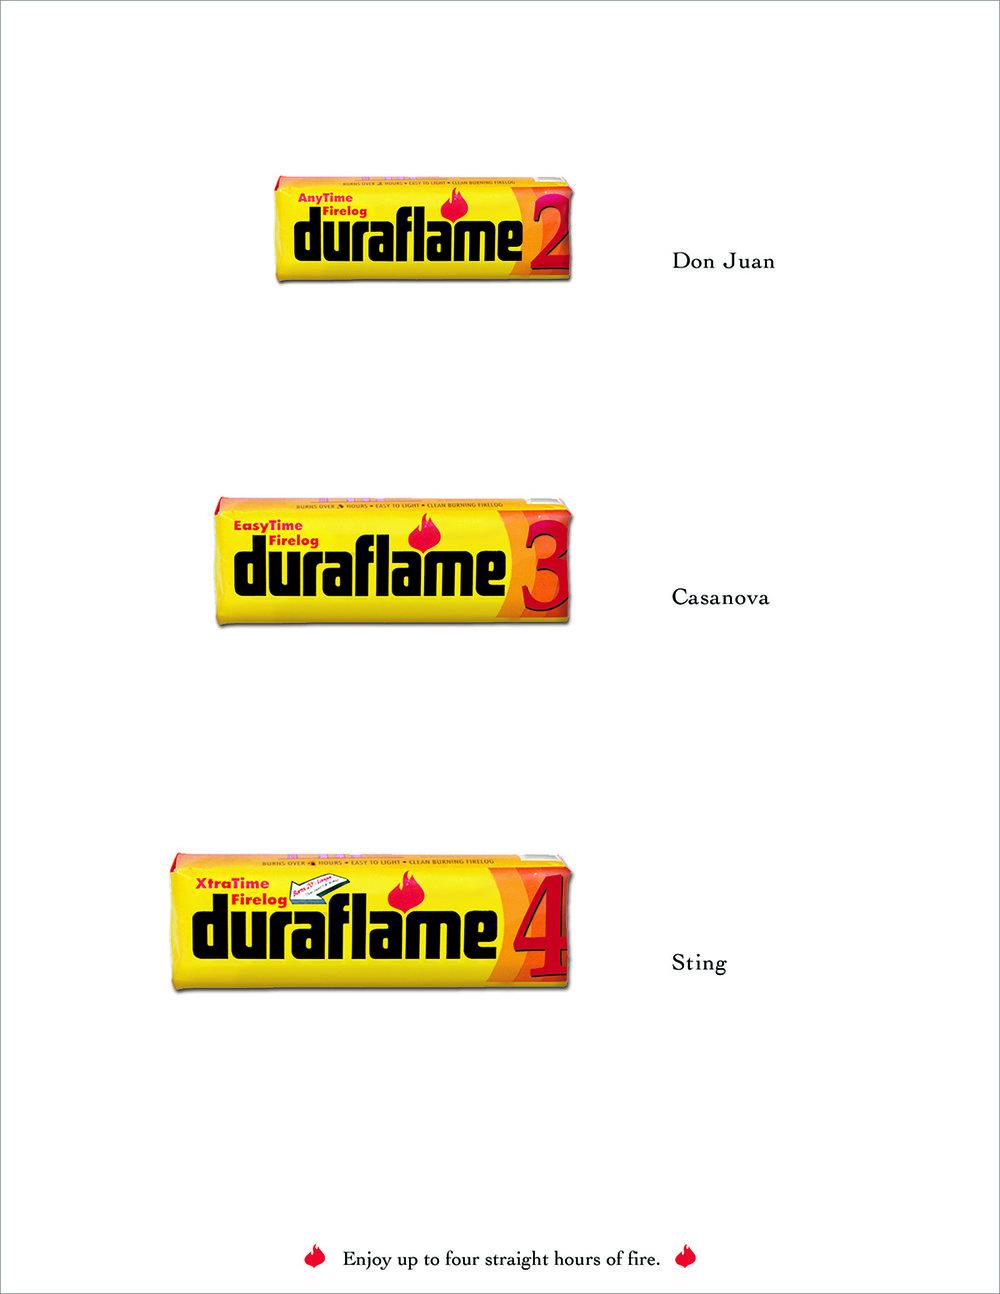 duraflame_sting.jpg